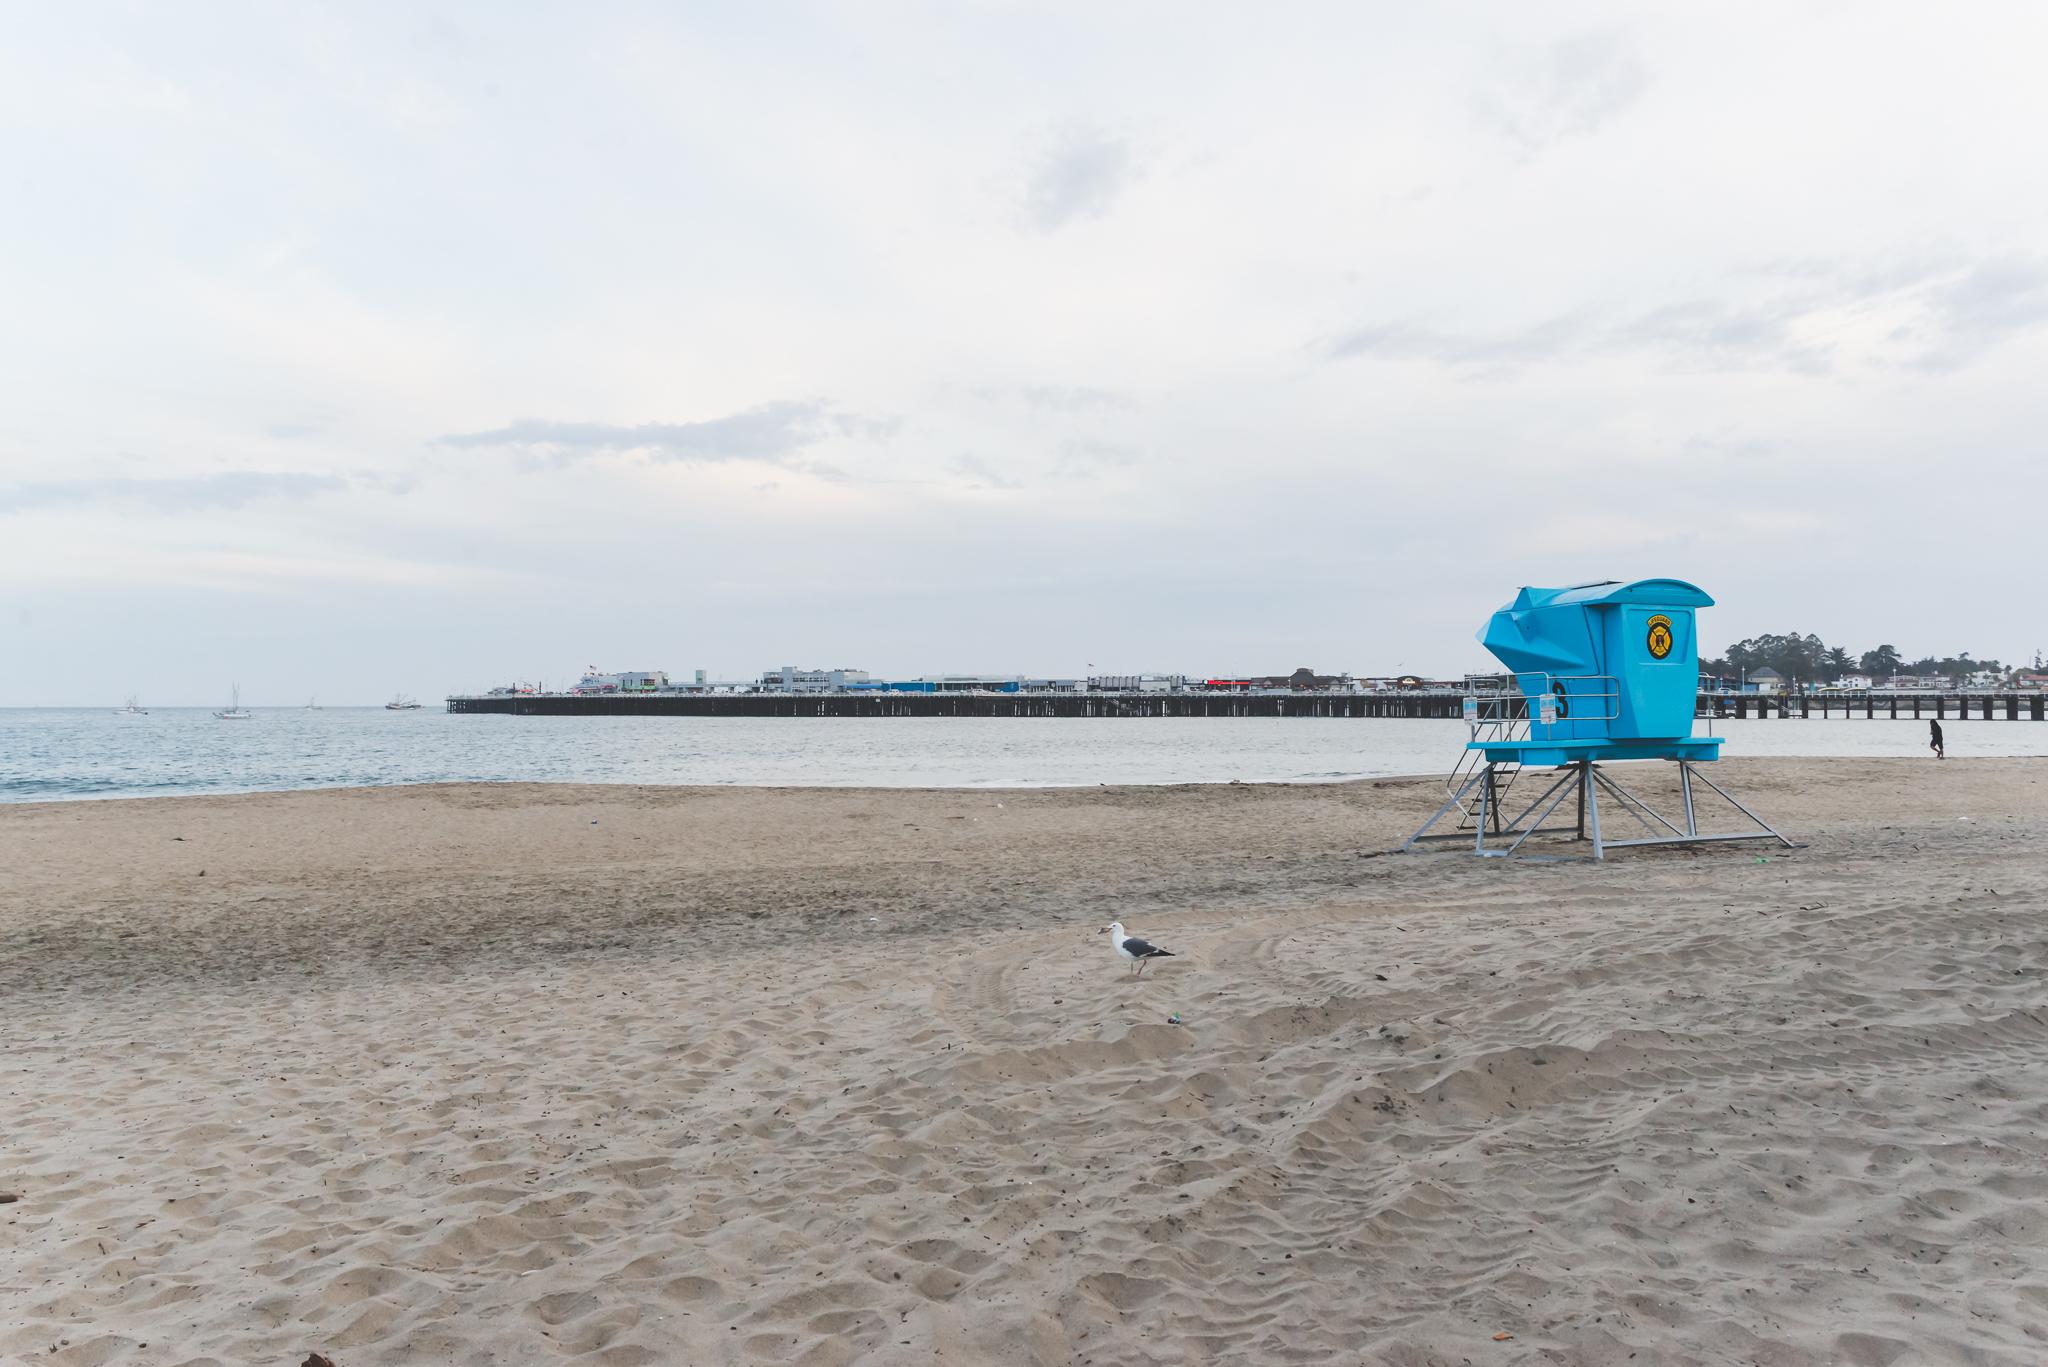 Lifeguard stand. / 5/3/16 / Santa Cruz, CA